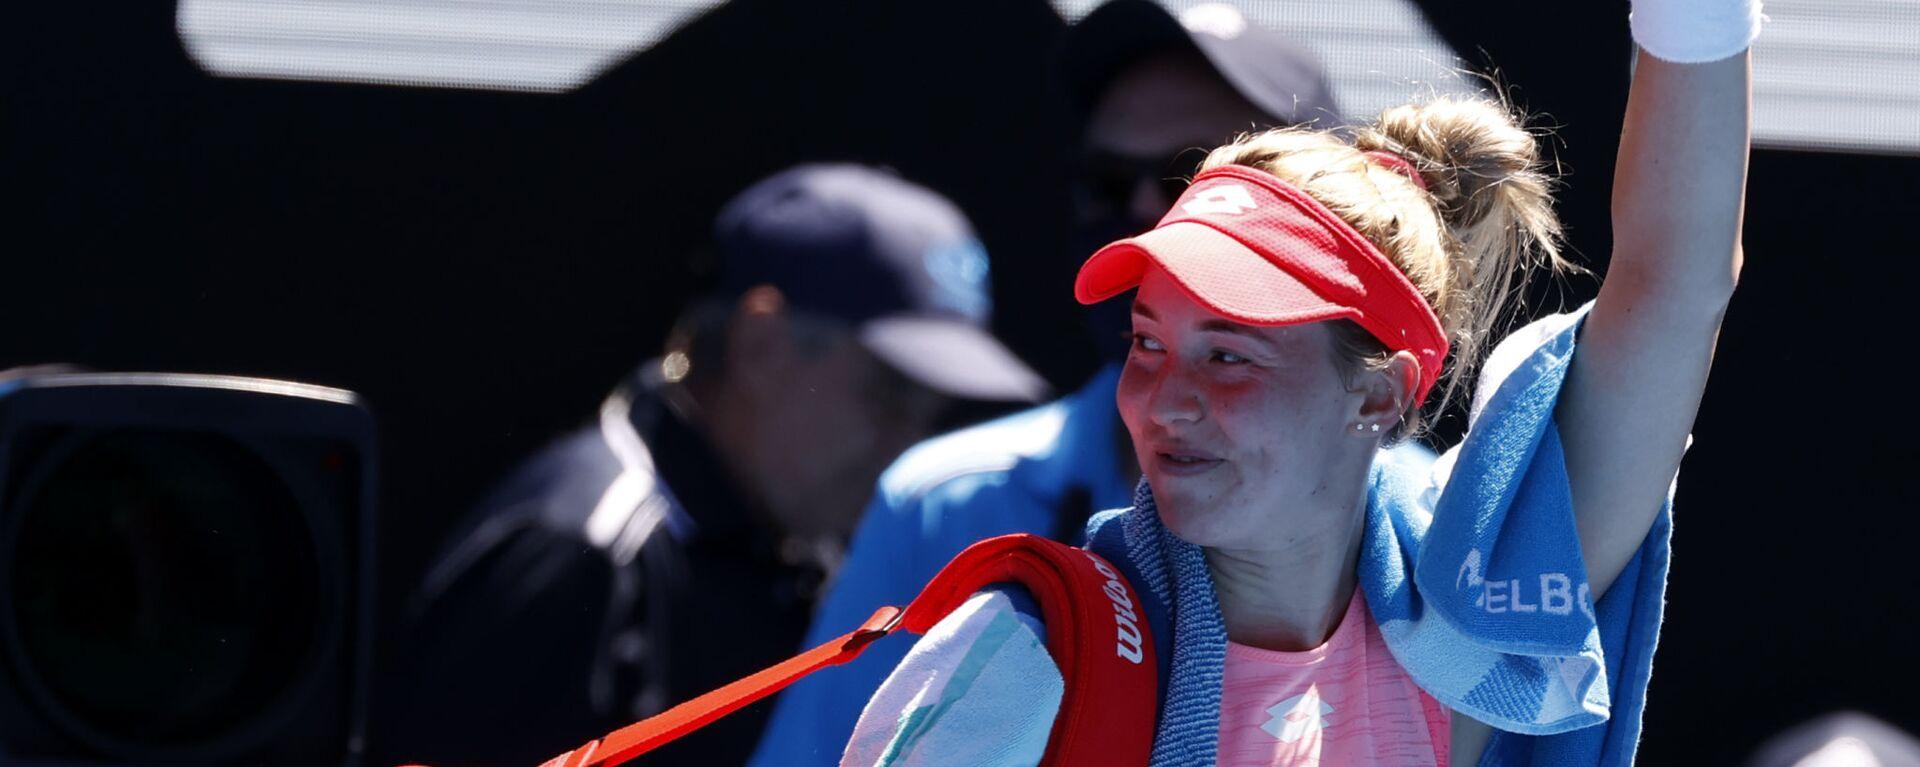 Српска тенисерка Нина Стојановић после пораза од Серене Вилијамс на Аустралијан опену 2021. - Sputnik Србија, 1920, 24.07.2021